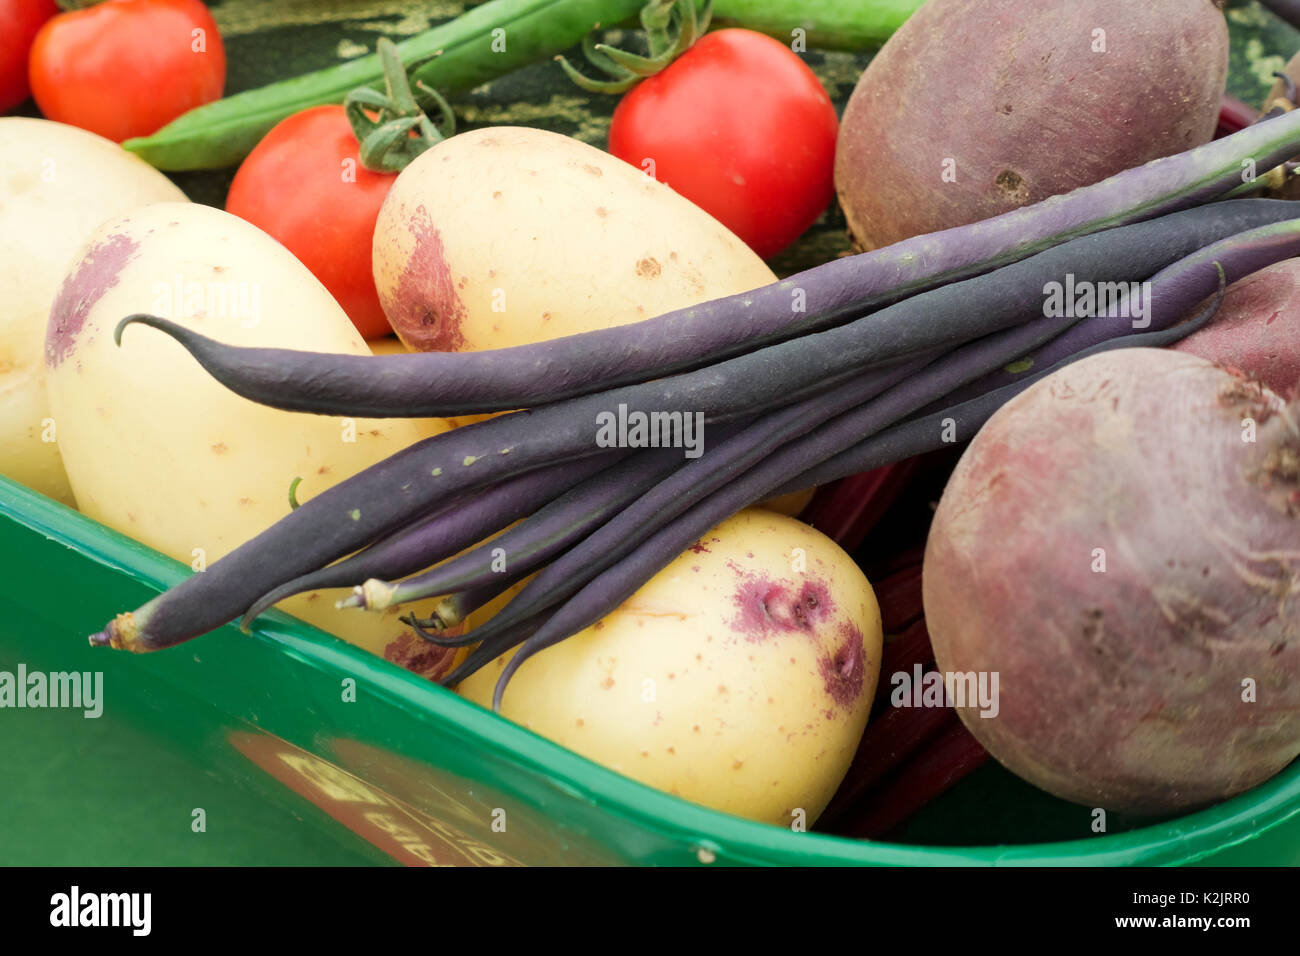 Raw vegetables close up England UK United Kingdom GB Great Britain - Stock Image